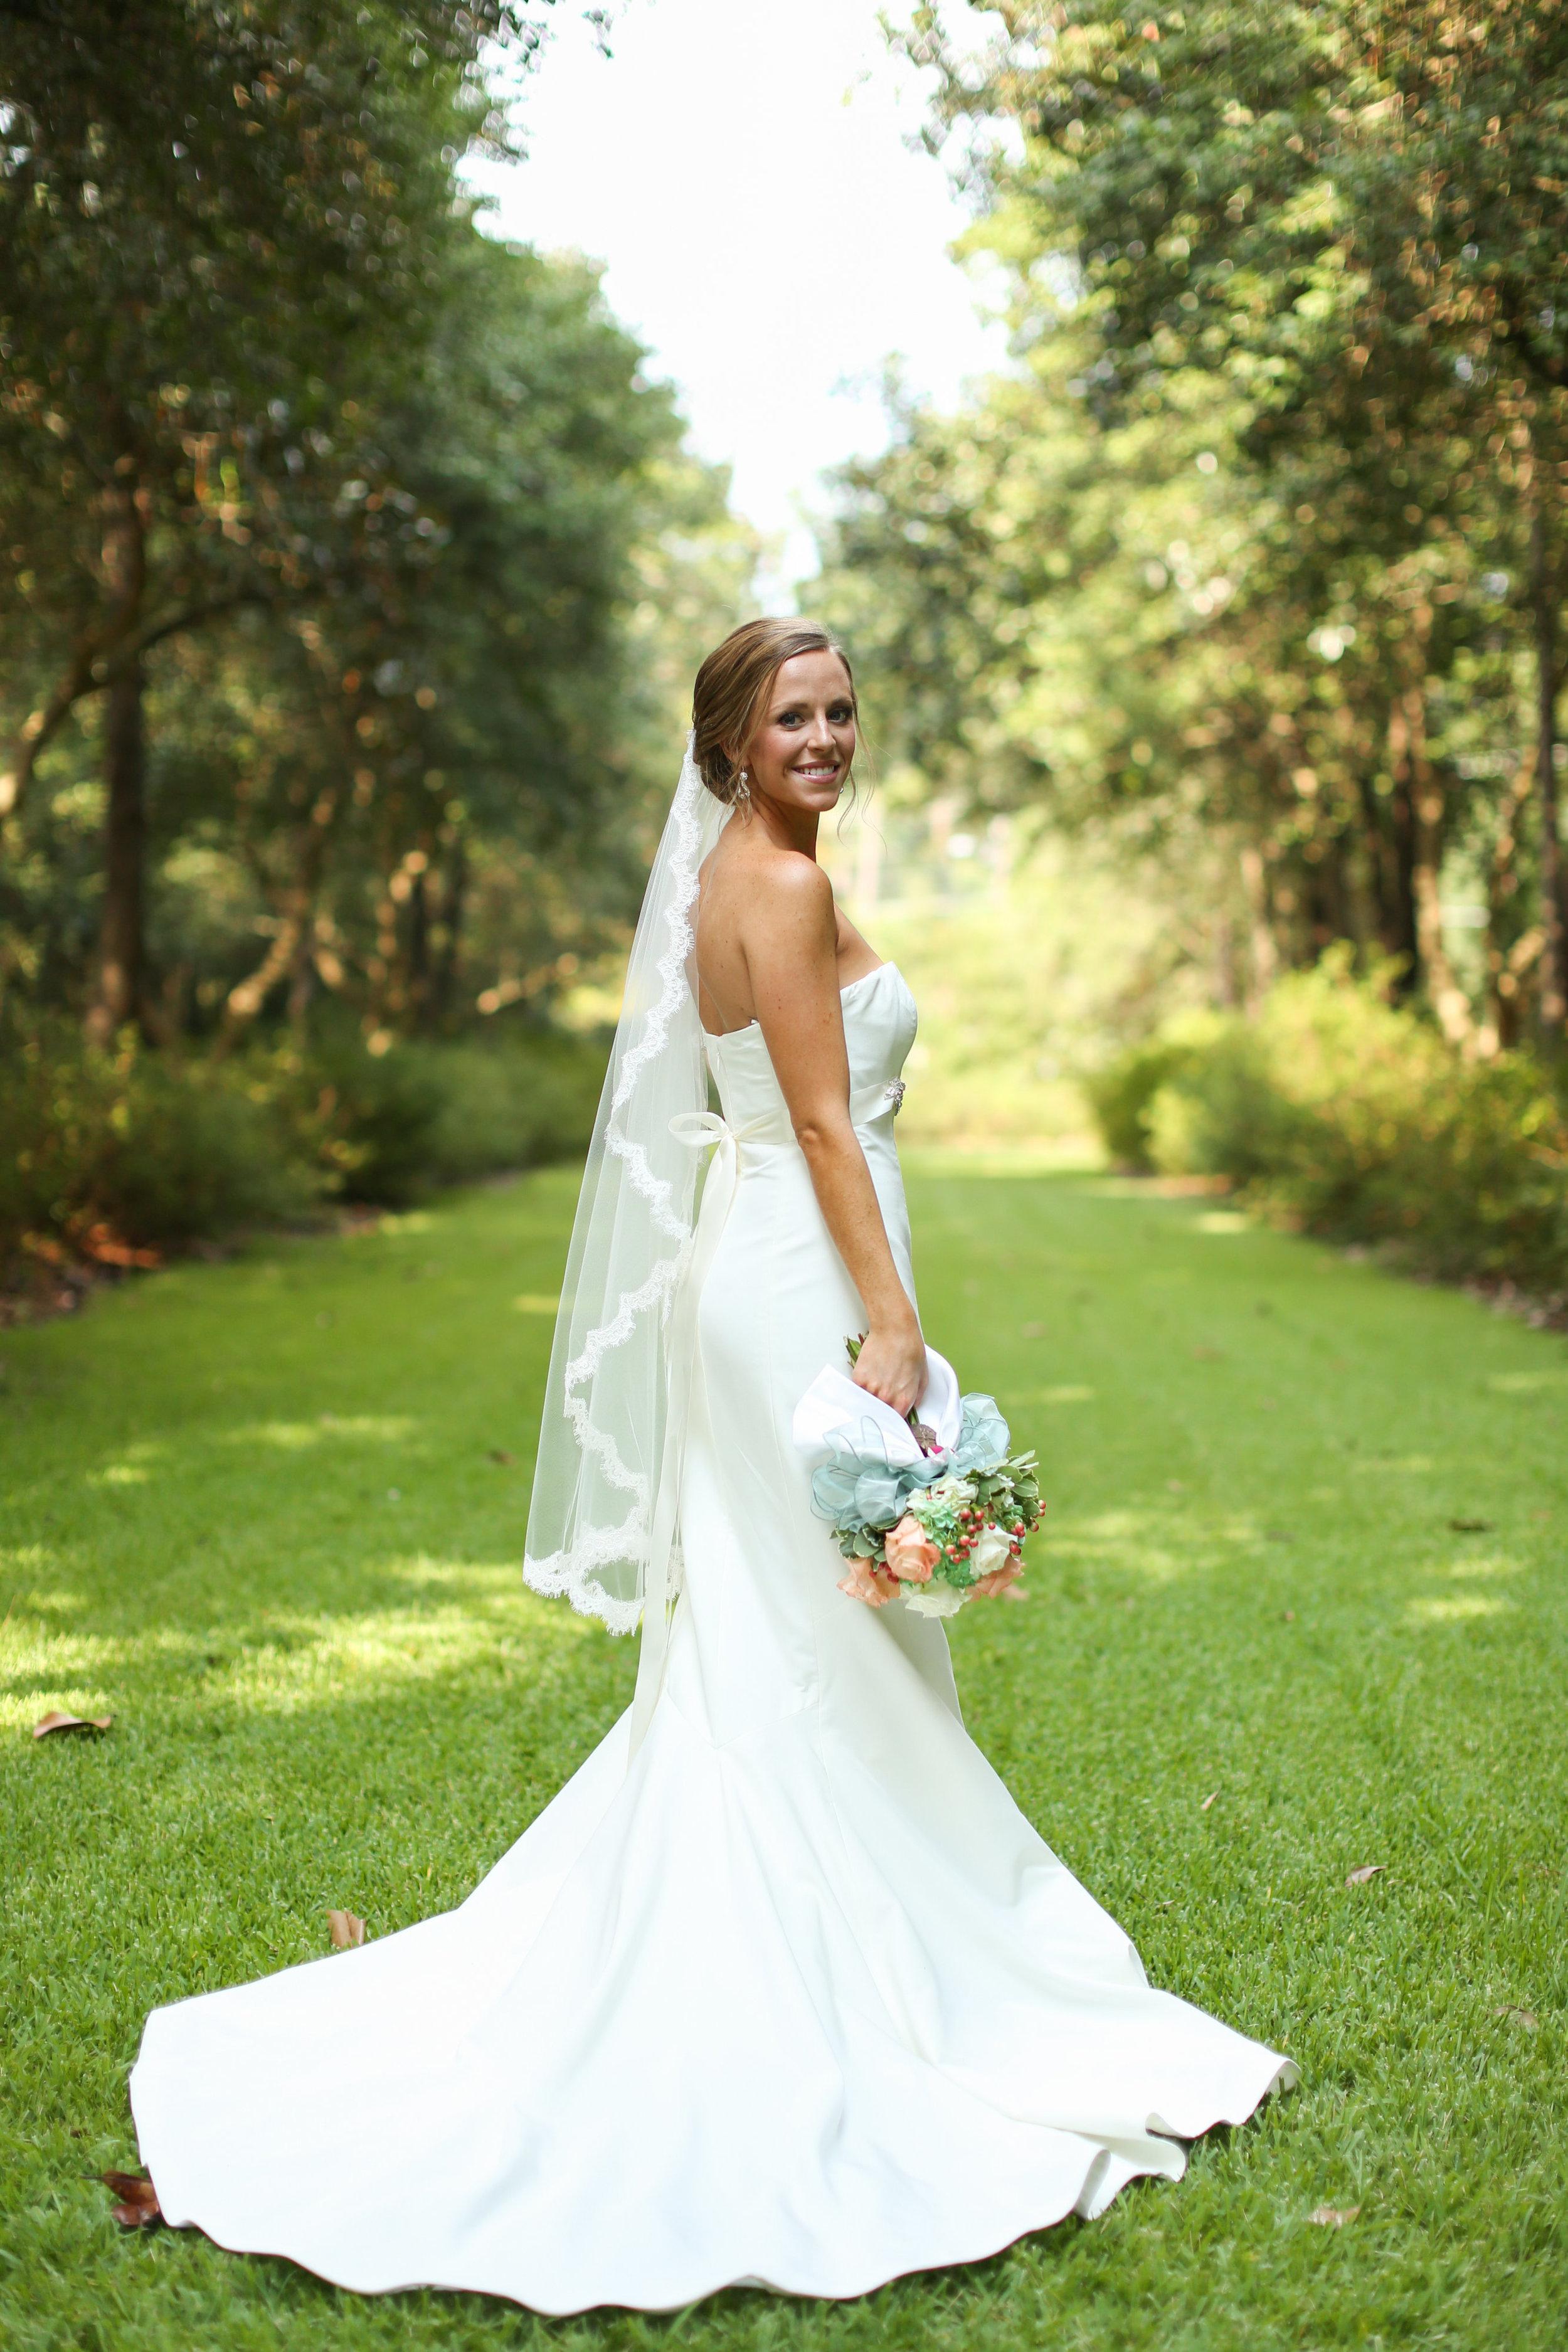 finnegan-photography-ivory-and-beau-bridal-boutique-nicole-miller-dakota-jaclyn-jordan-anne-veil-savannah-bridal-boutique-savannah-wedding-dresses-savannah-weddings-statesboro-wedding-barn-wedding-savannah-bridal-georgia-bridal-boutique-10.jpg